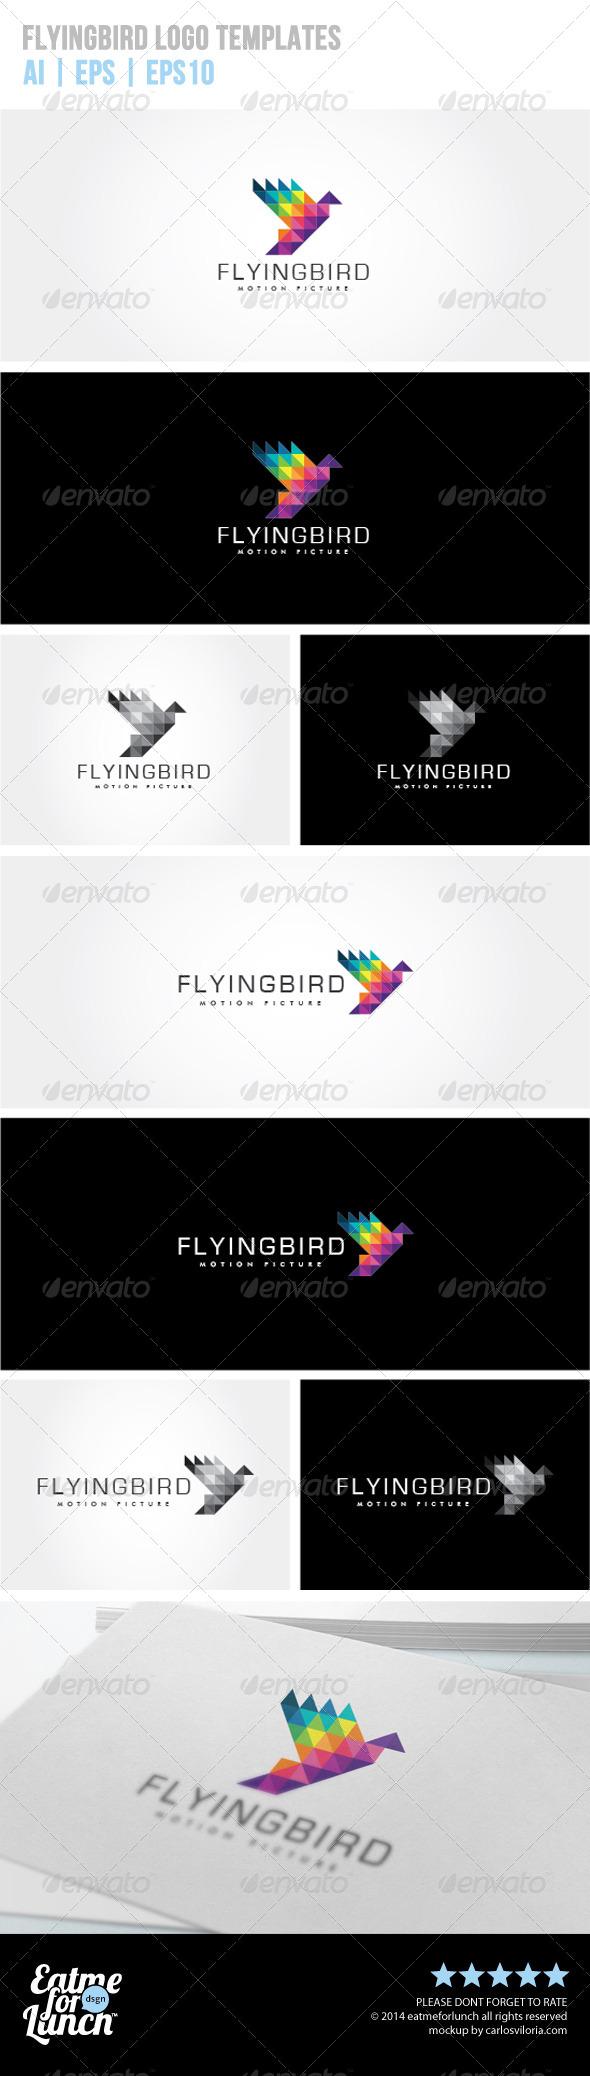 GraphicRiver Flying Bird Logo Templates 7679007